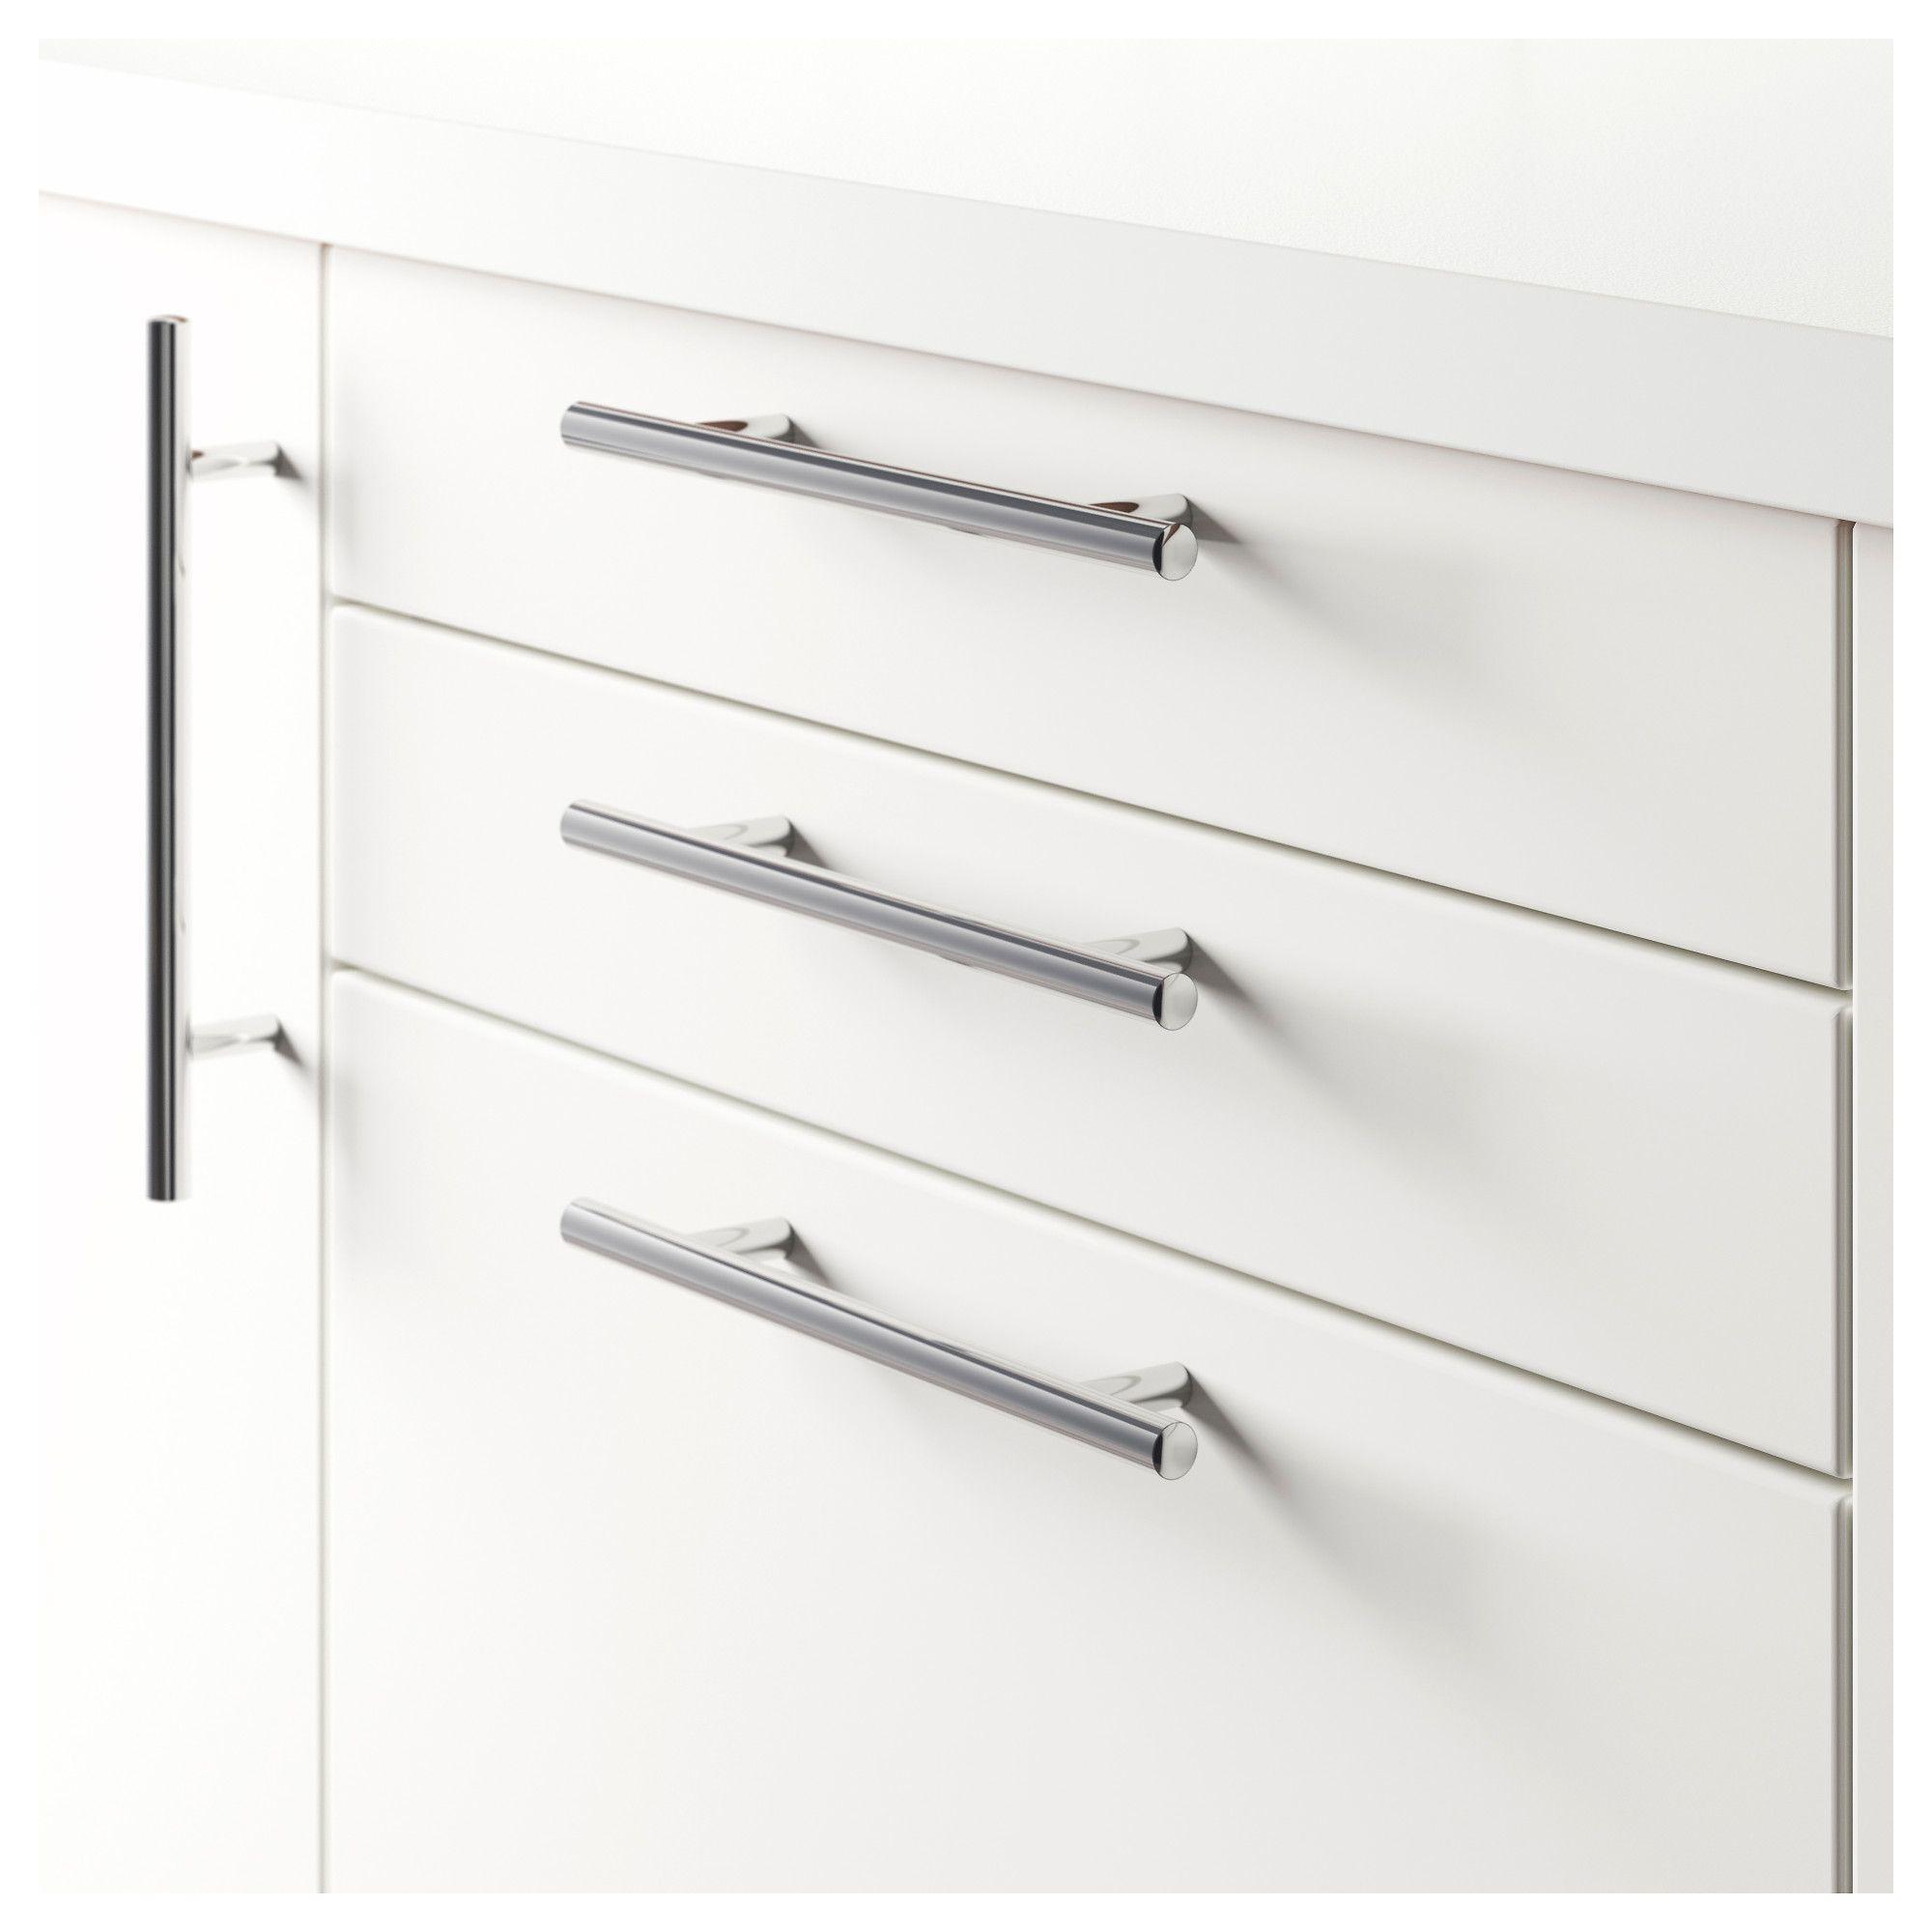 lansa handle stainless steel 245 mm home ideas pinterest ikea rh pinterest com Metal Cabinet Pull Square Cabinet Edge Pull